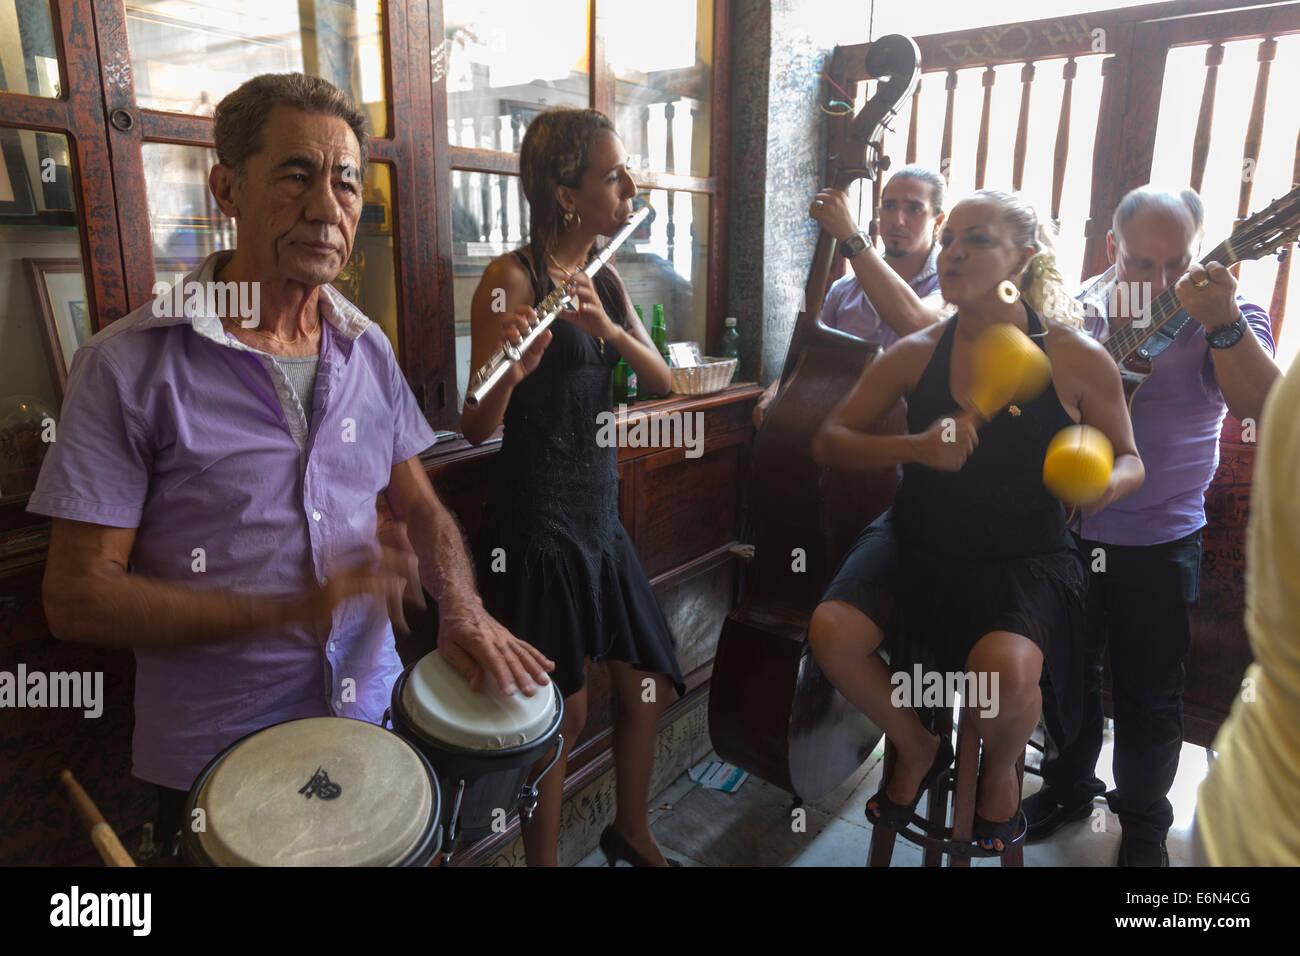 Musikern in La Bodeguita del Medio Bar, Havanna, Kuba Stockbild